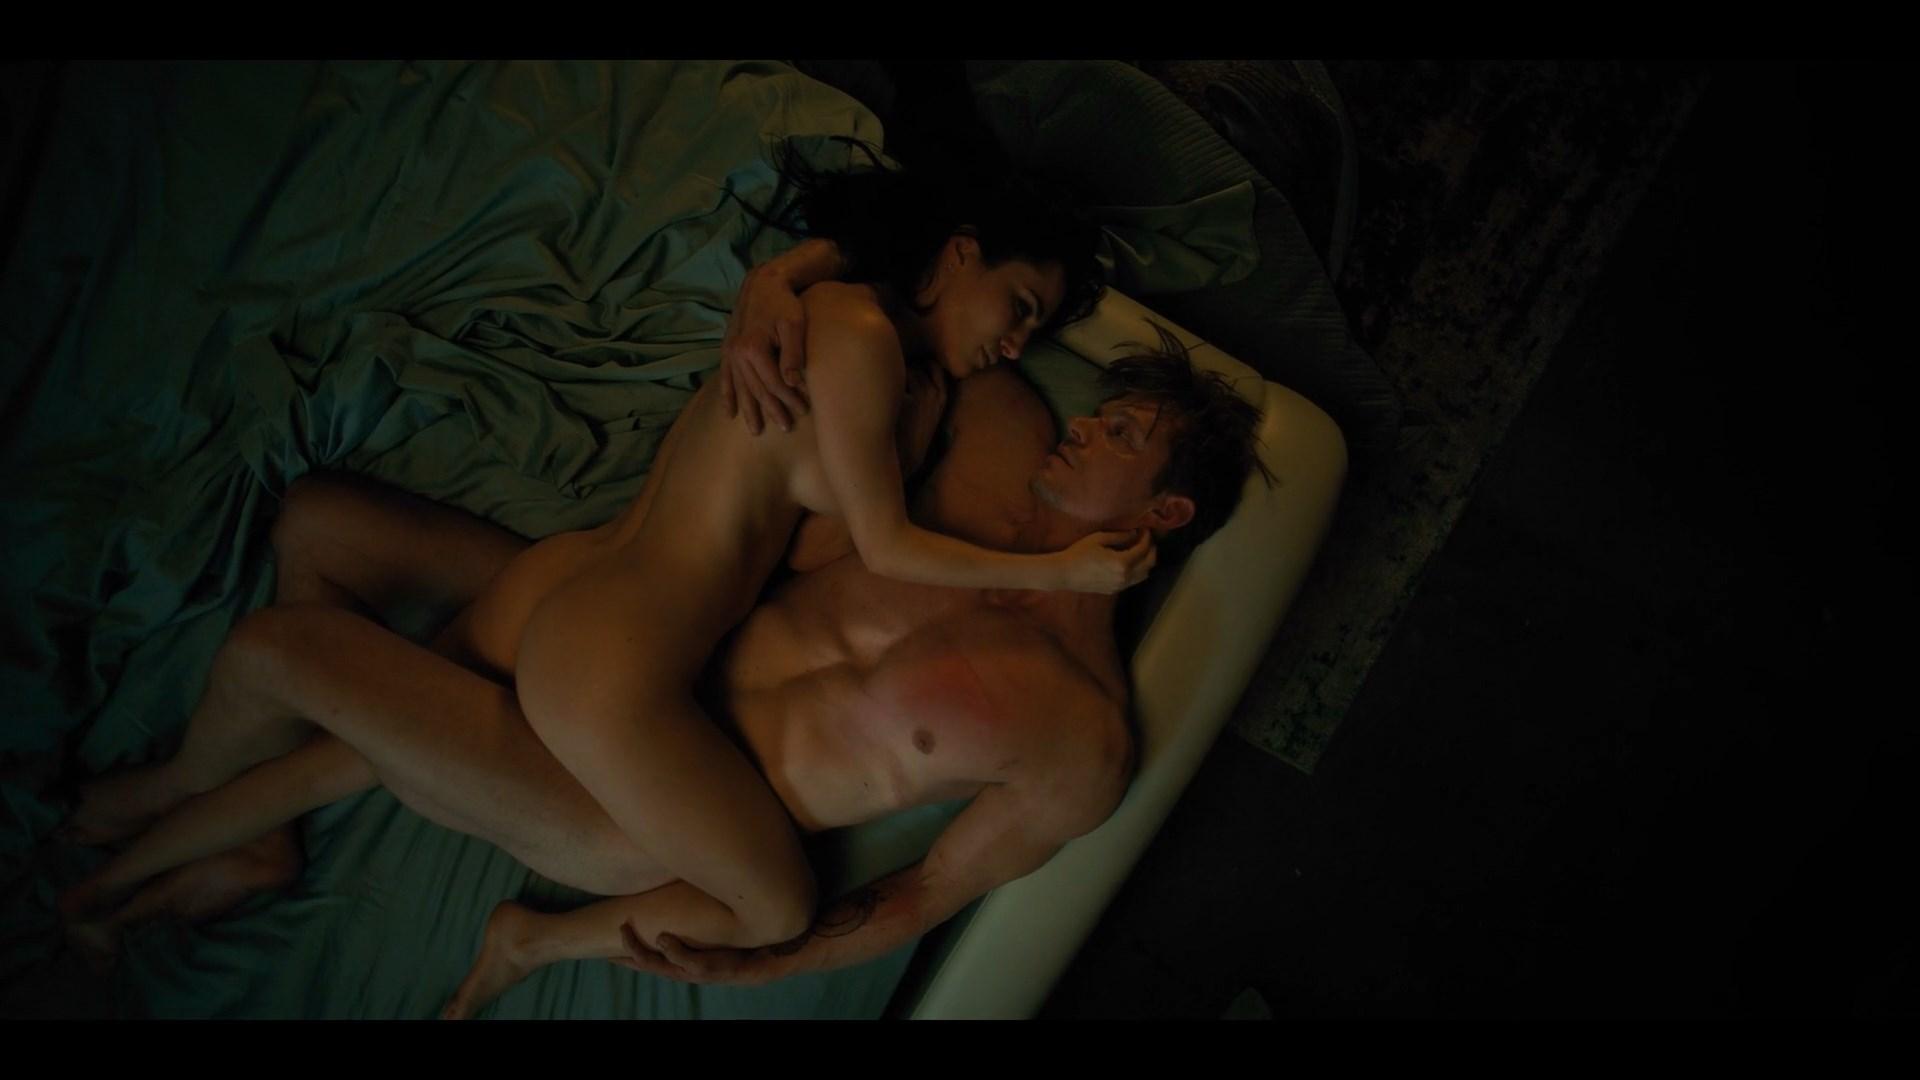 Ariadna Gil Follando martha higareda altered carbon s01e05 1080p nude celebrity